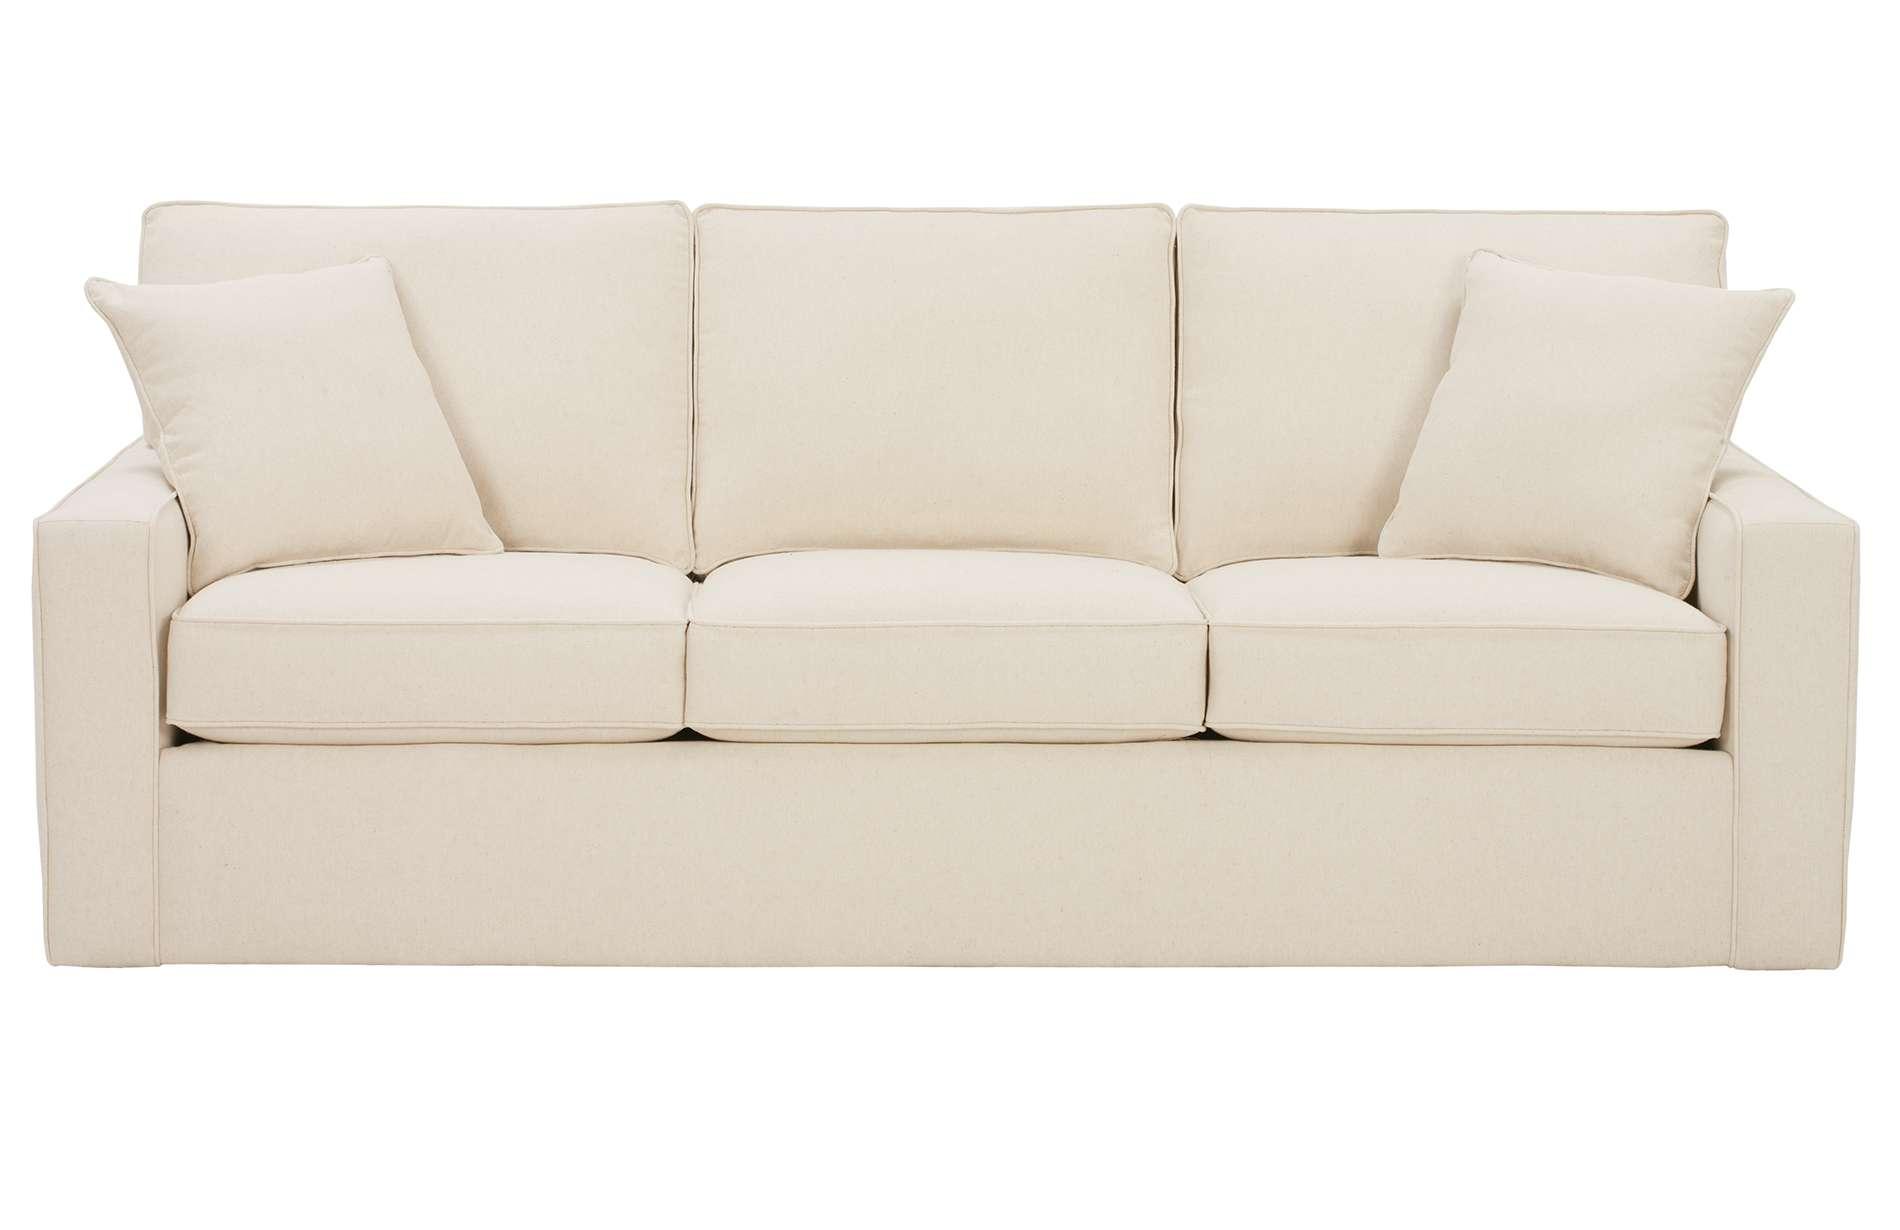 D180 Monaco Fabric 86 Sofa By Rowe Rudd Furniture